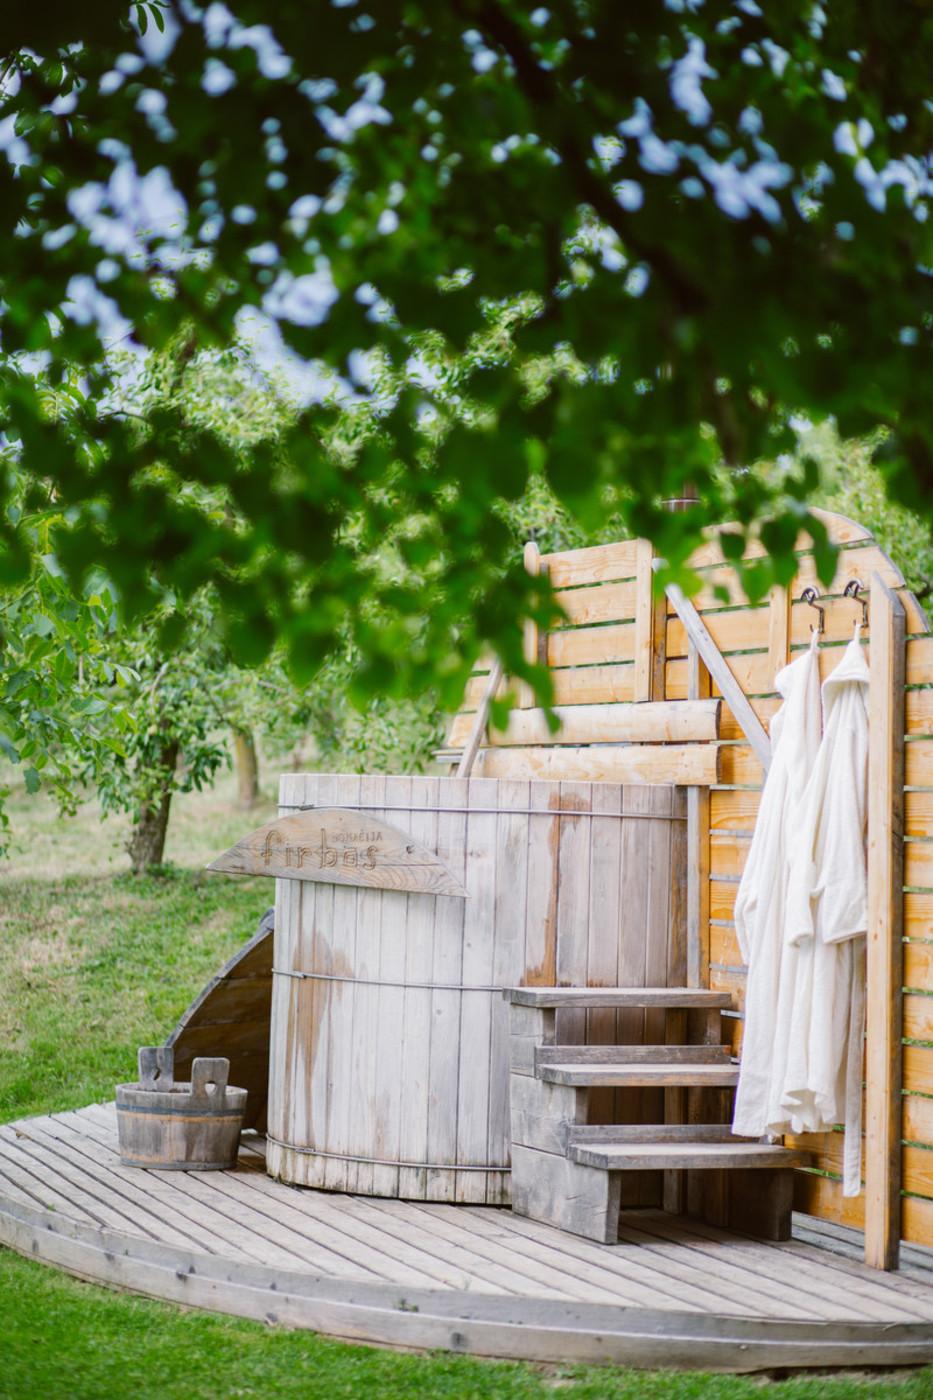 firbas farmstay slovenia